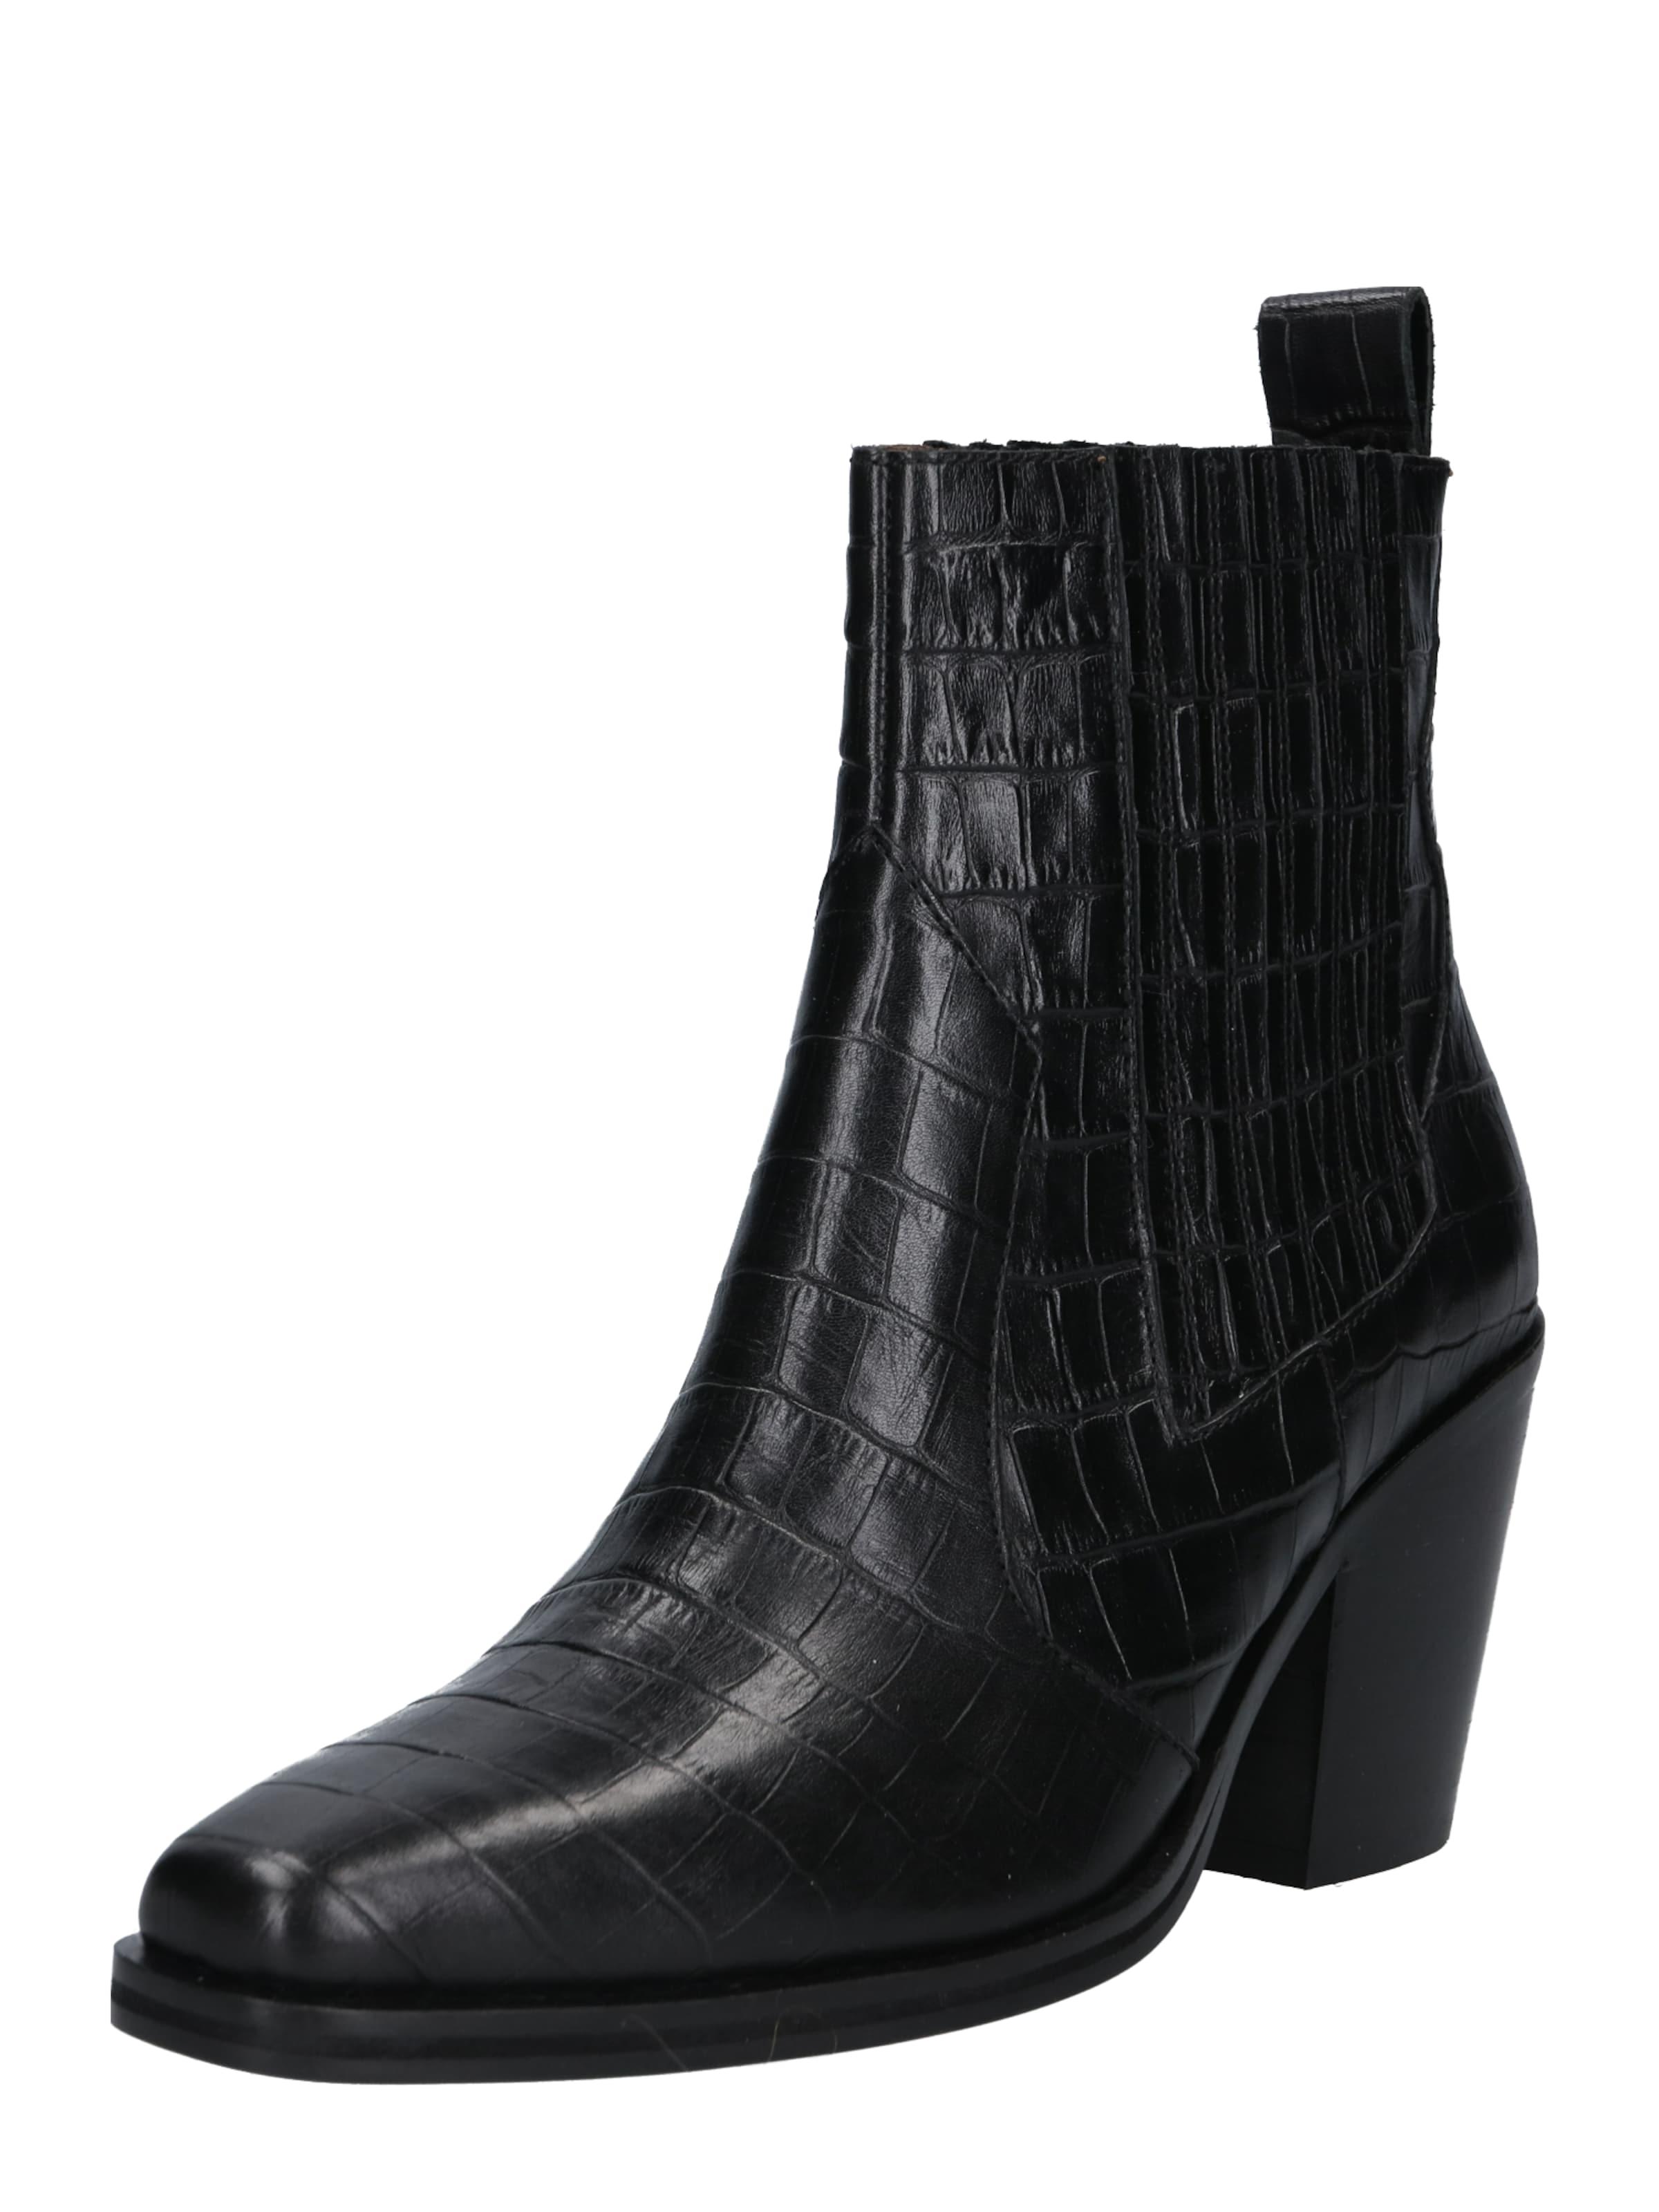 About You Shoe' En Chelsea Boots Noir 'nila l1J3TFKc